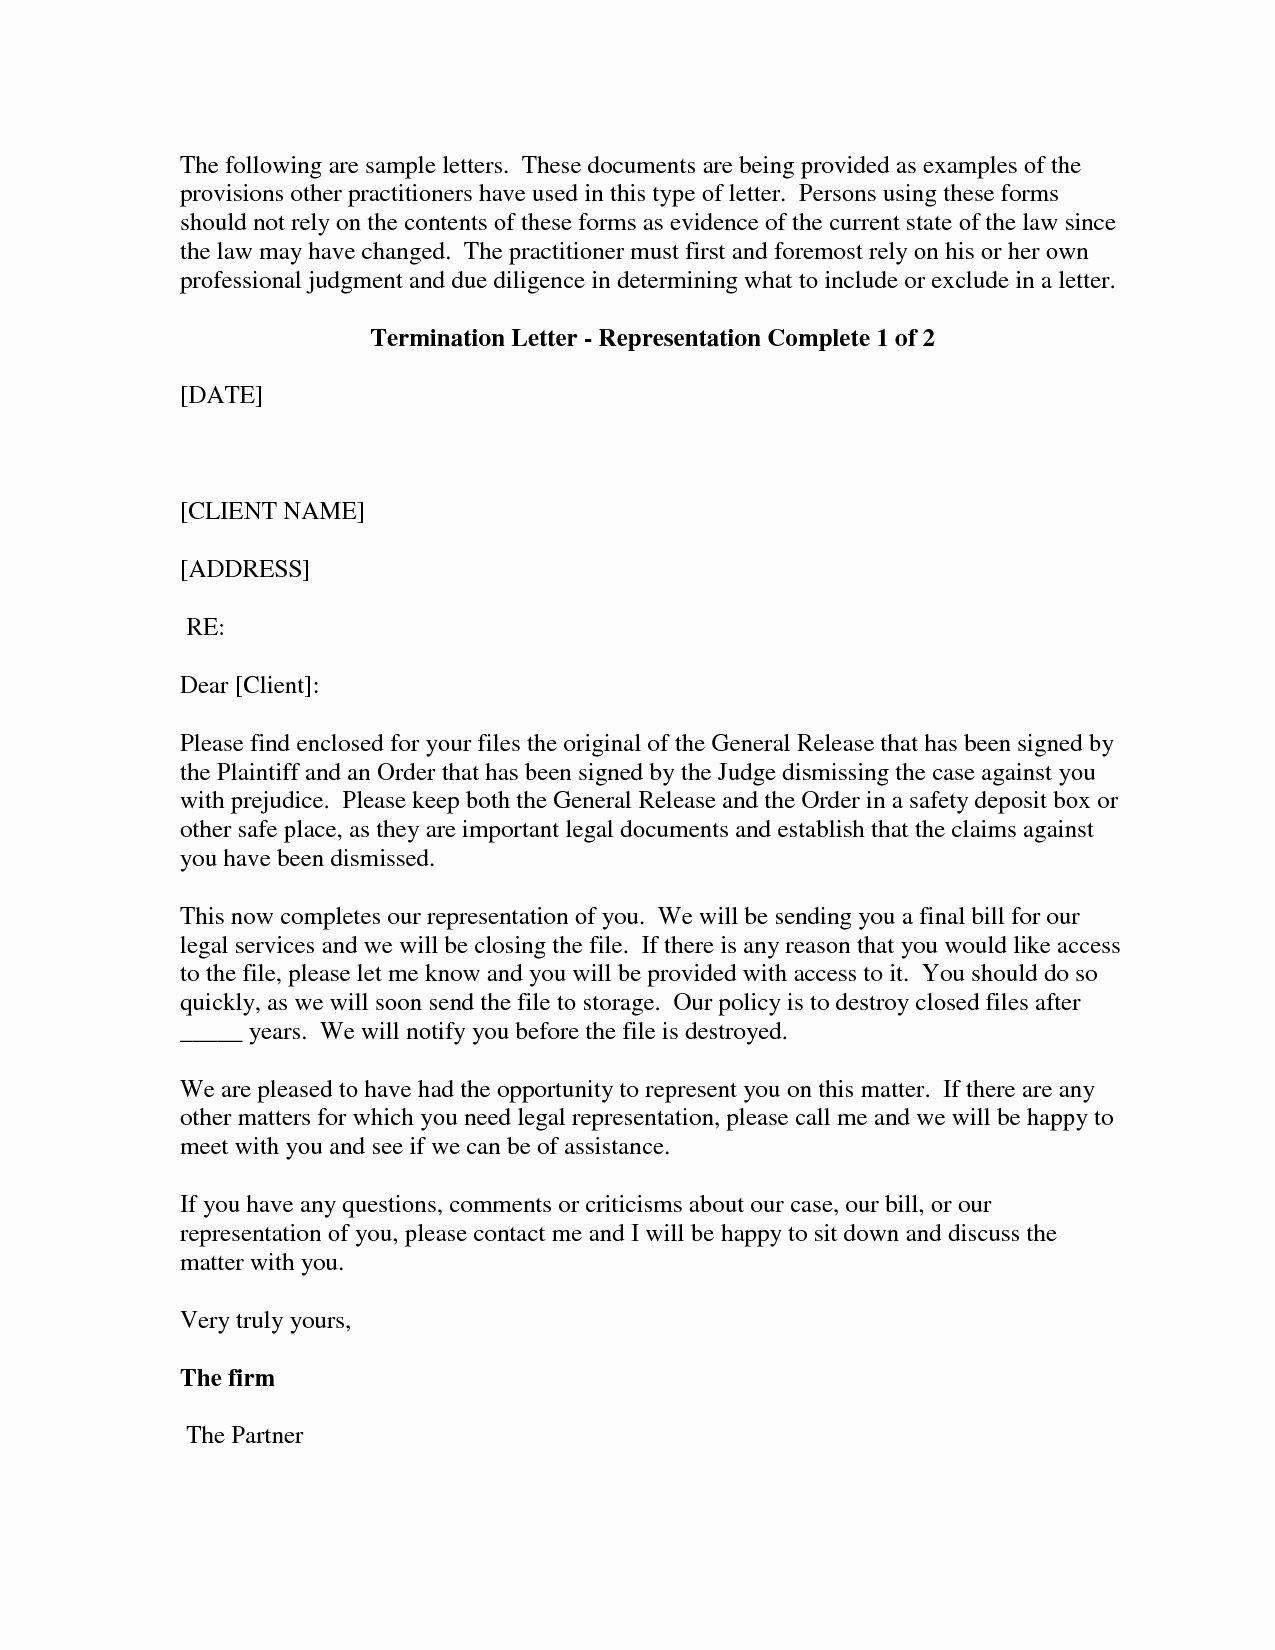 Attorney Client Letter Template Unique Letter Termination Free Printable Documents Letter Templates Lettering Letter Template Word Sample attorney letter of representation